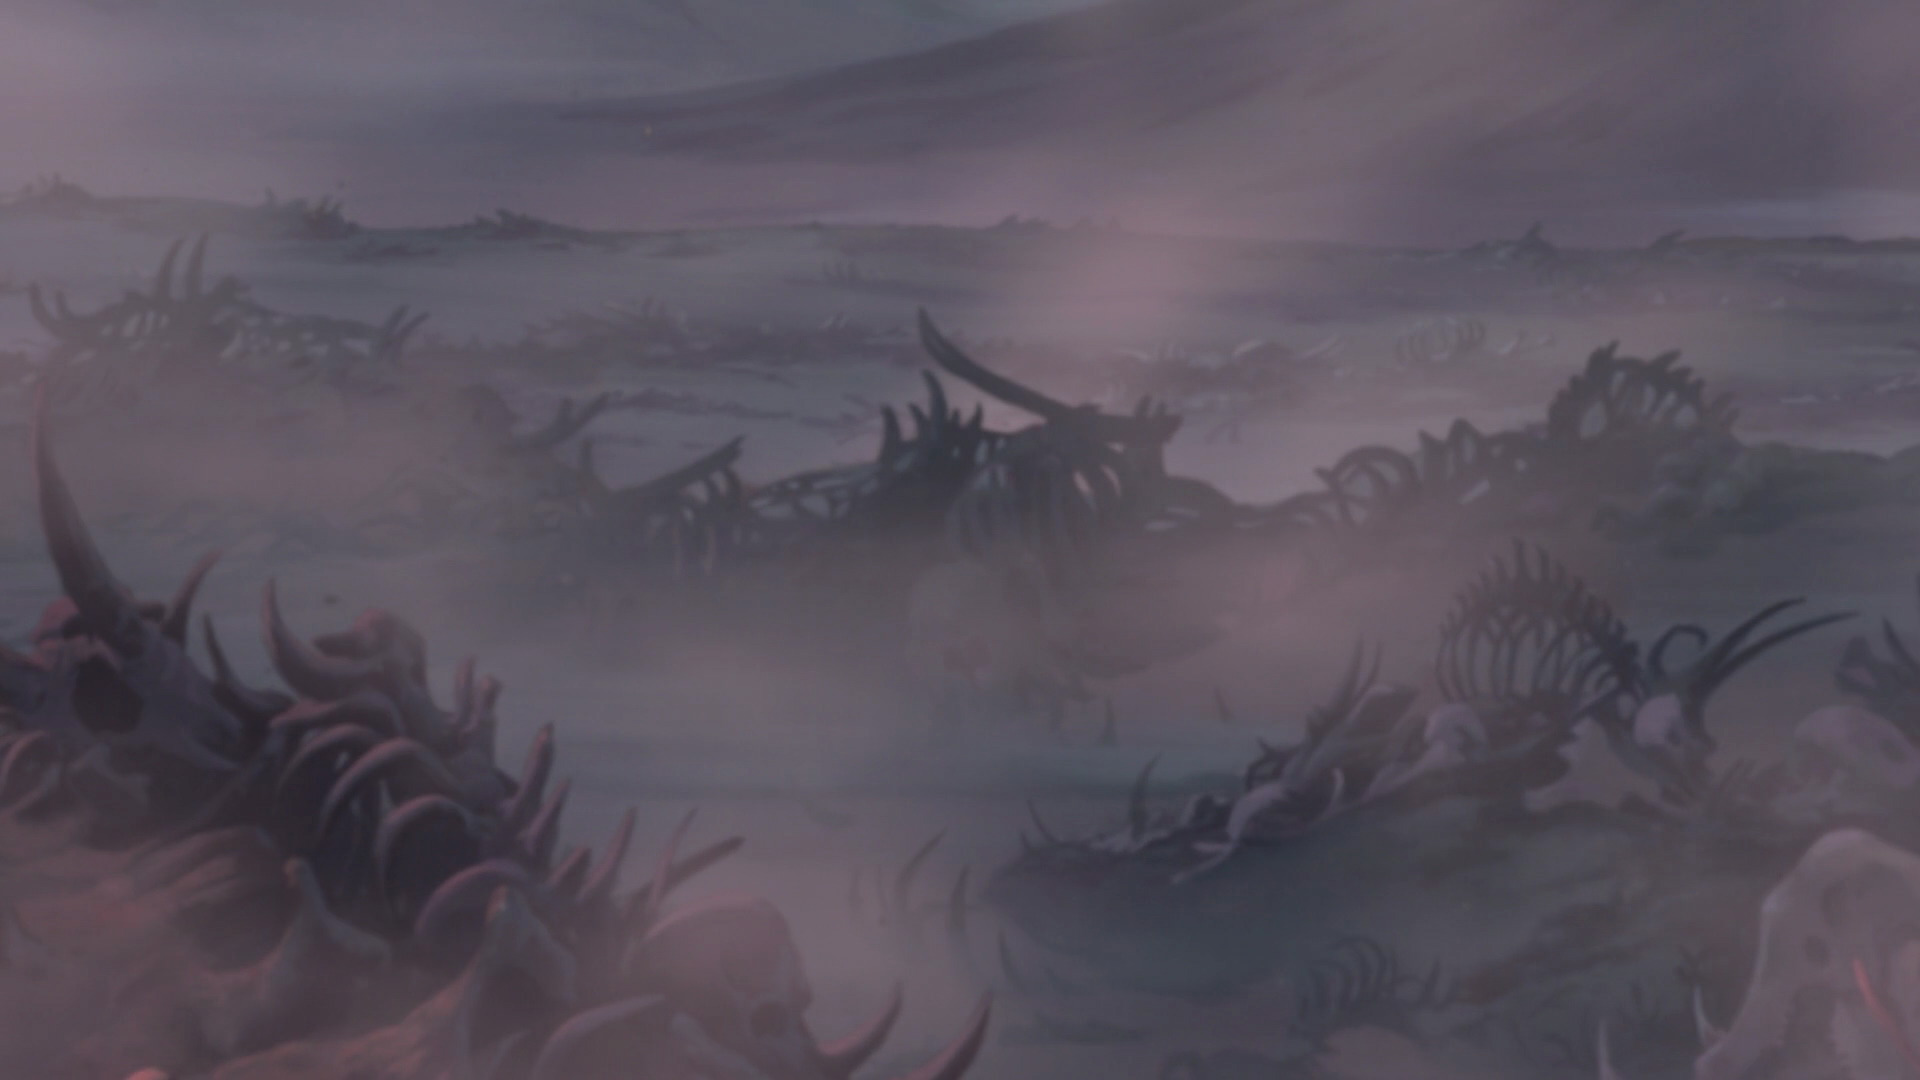 La Historia de Kovu  (Fan-Fiction) - Página 2 The_Elephant_Graveyard